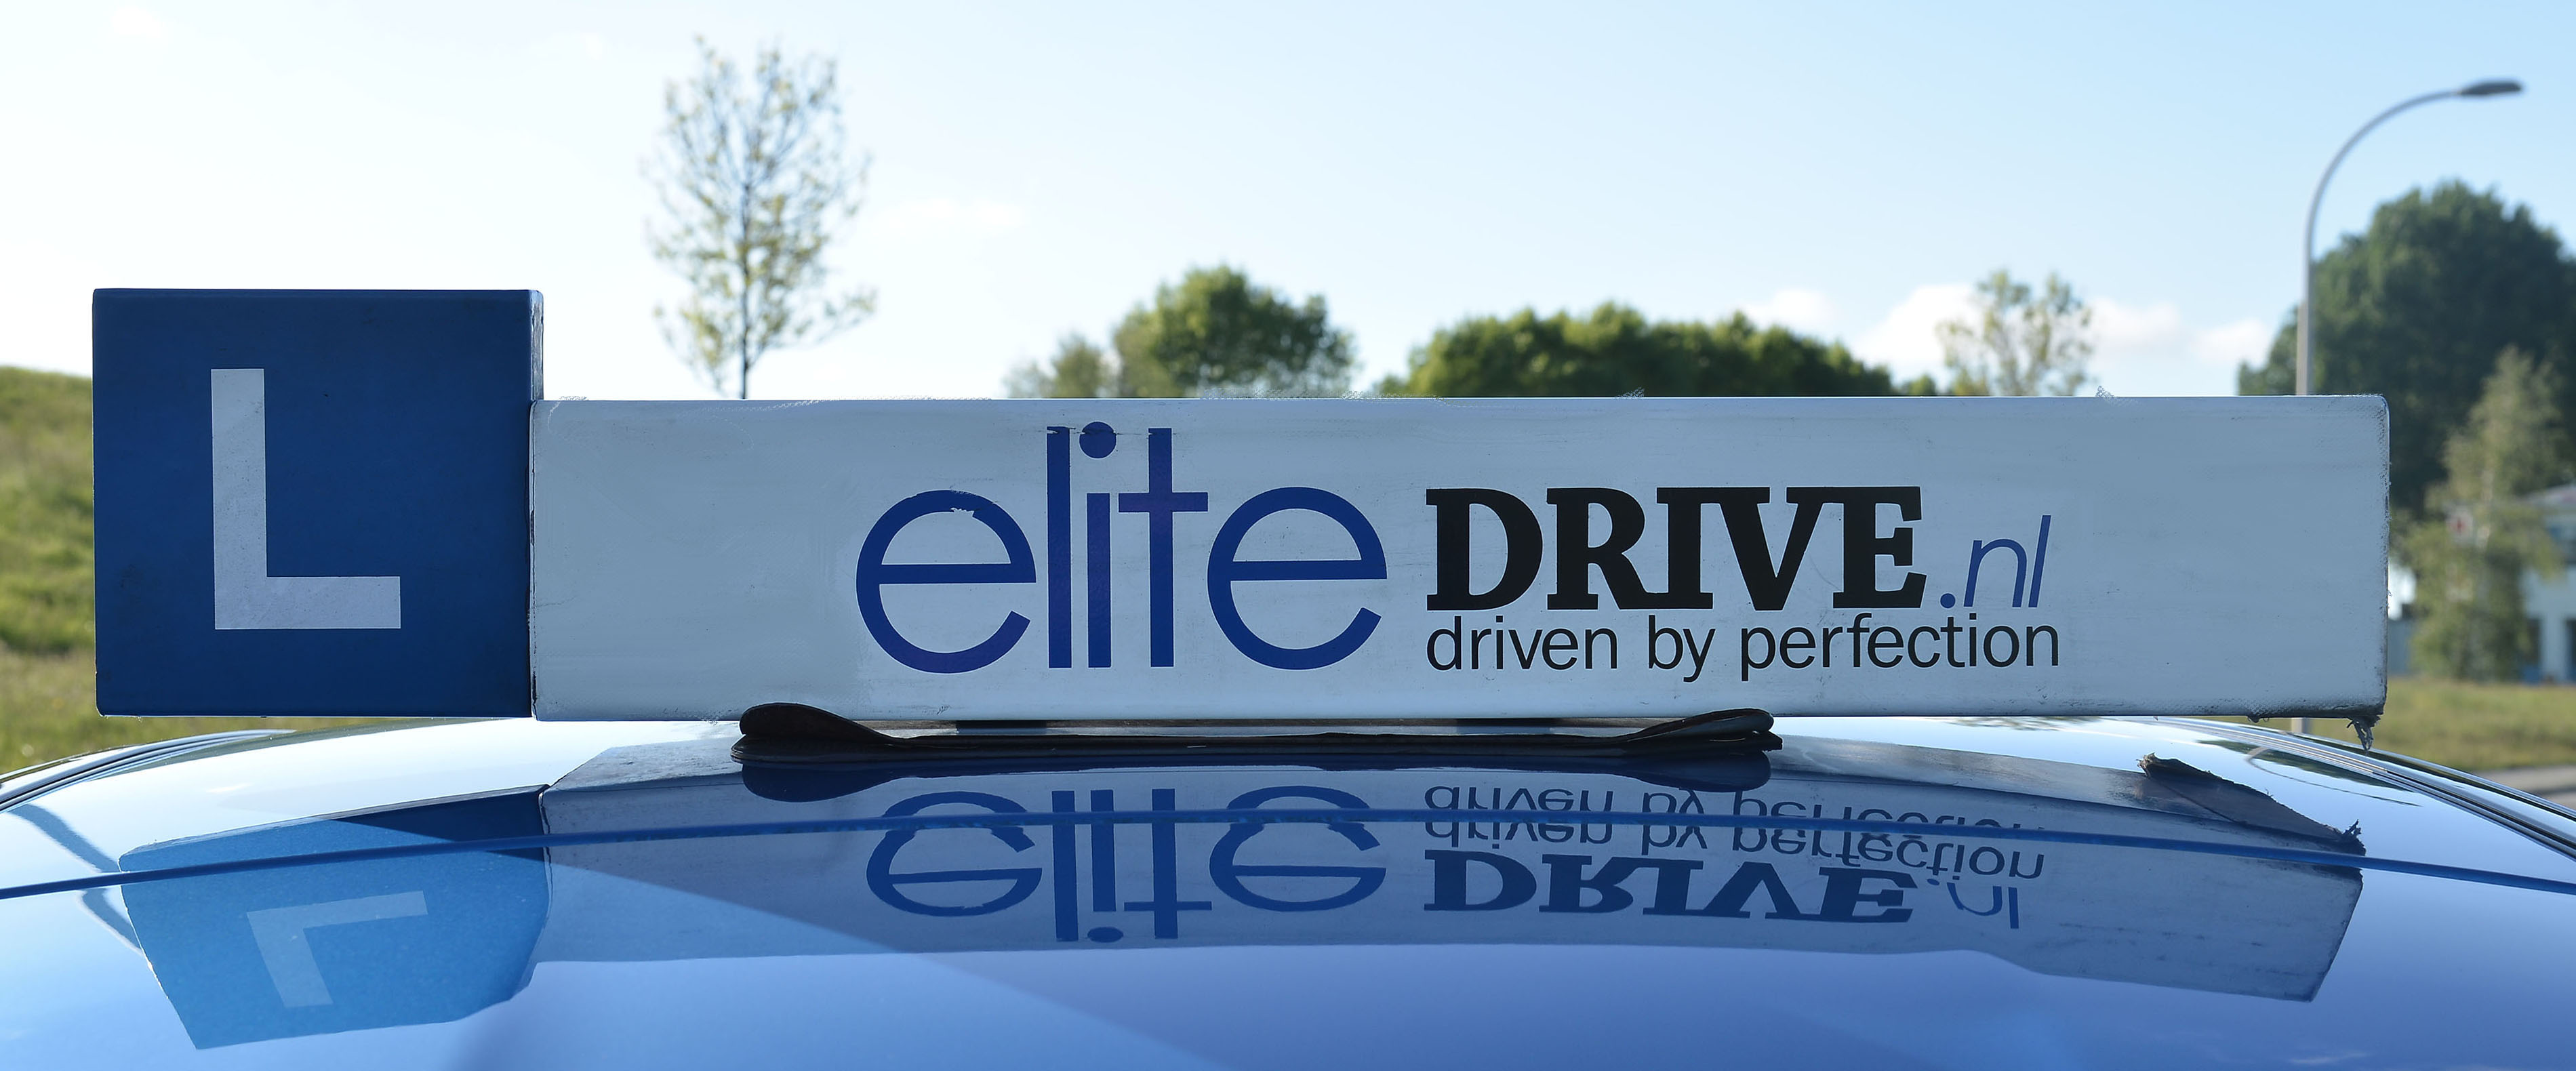 Binnen de kortste keren je rijbewijs?